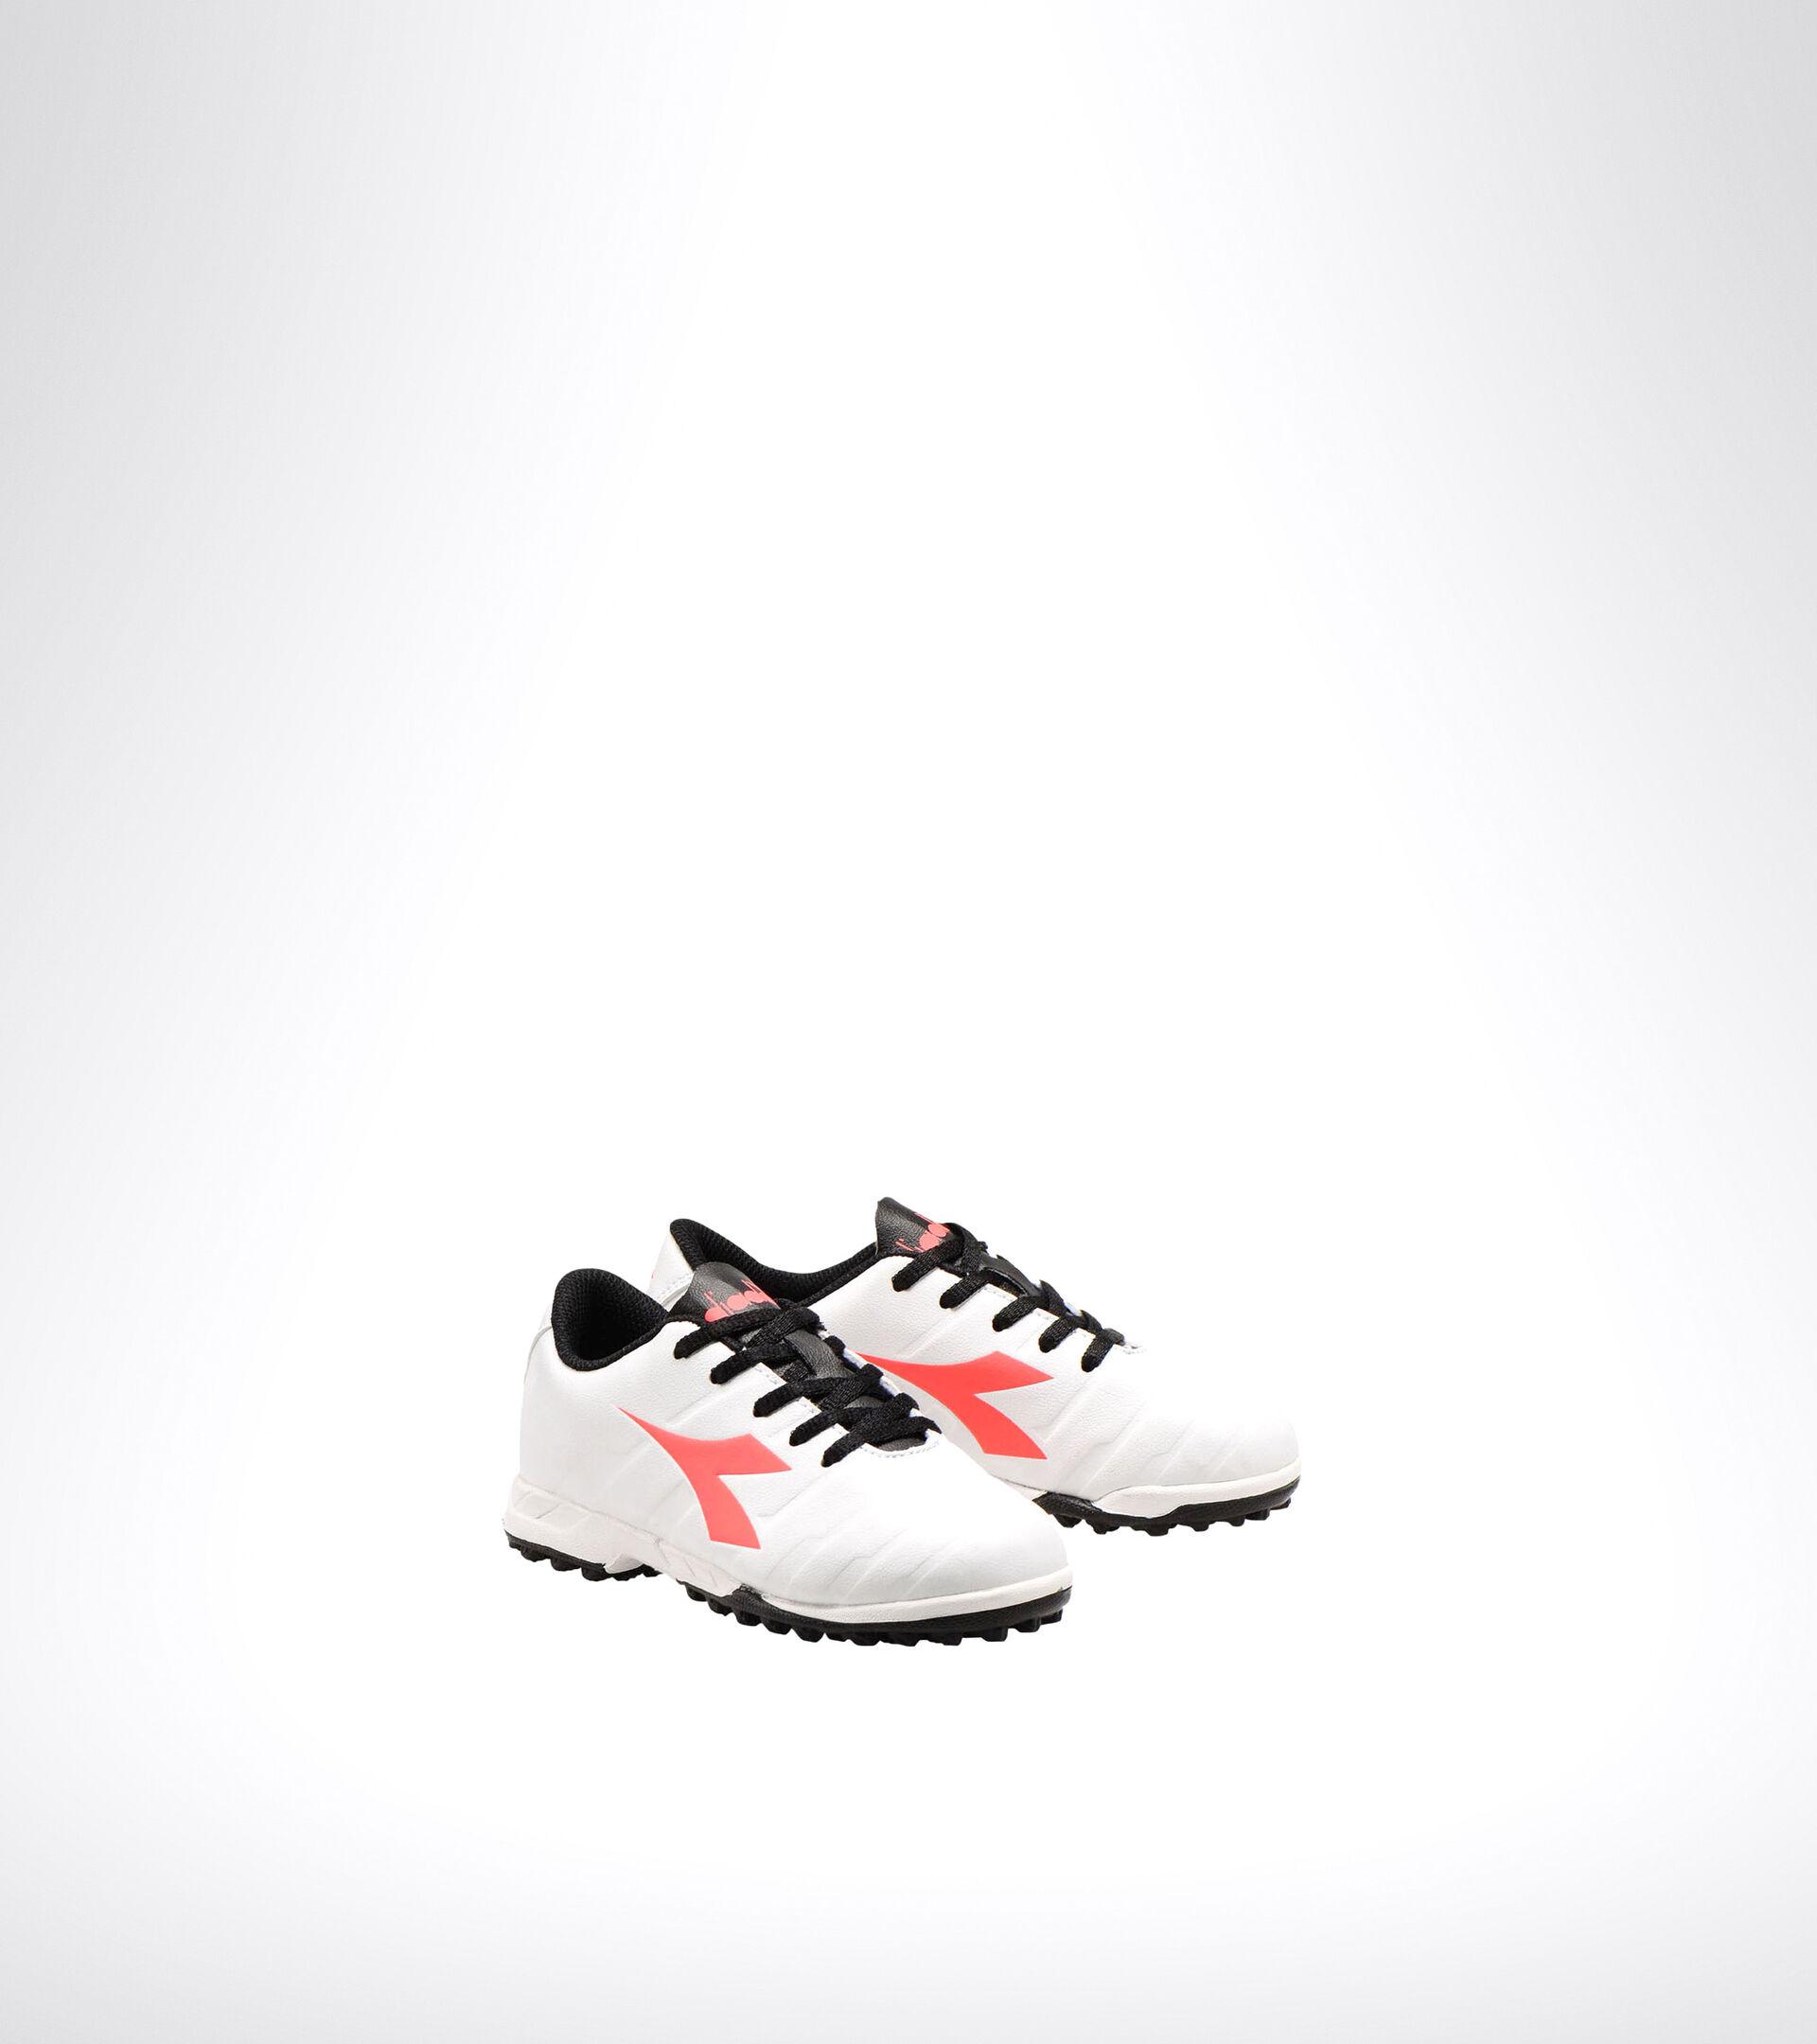 Footwear Sport BAMBINO PICHICHI 3 TF JR BIANCO/NERO/ROSSO FLUO Diadora